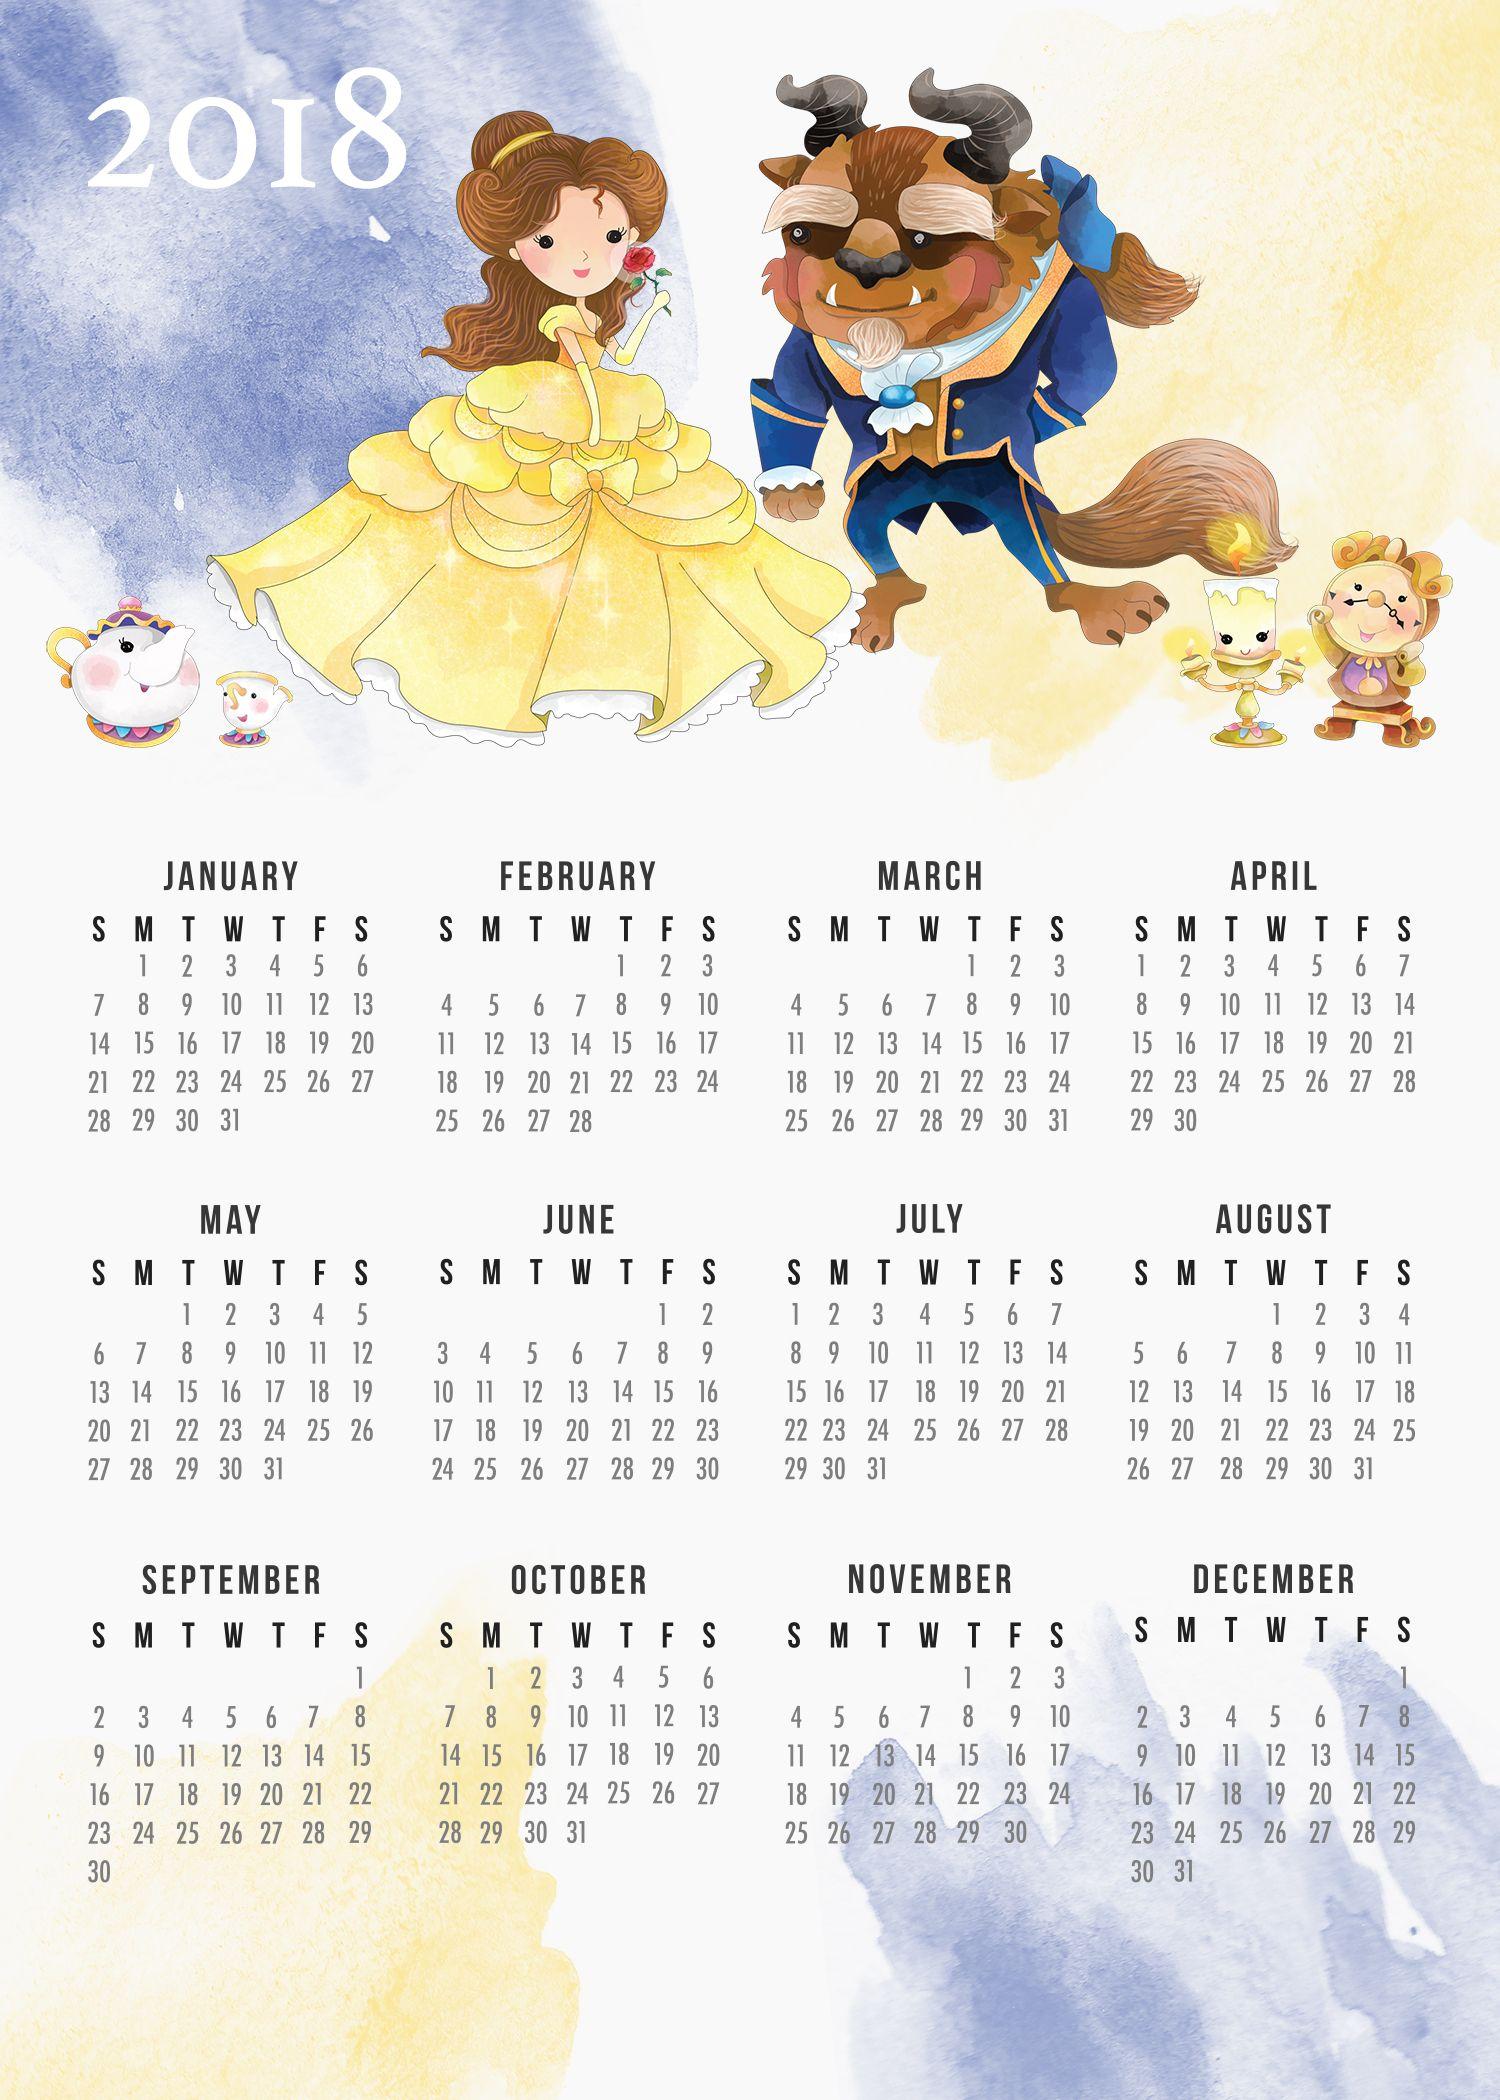 Free Printable 2018 Beauty and the Beast Calendar Disney